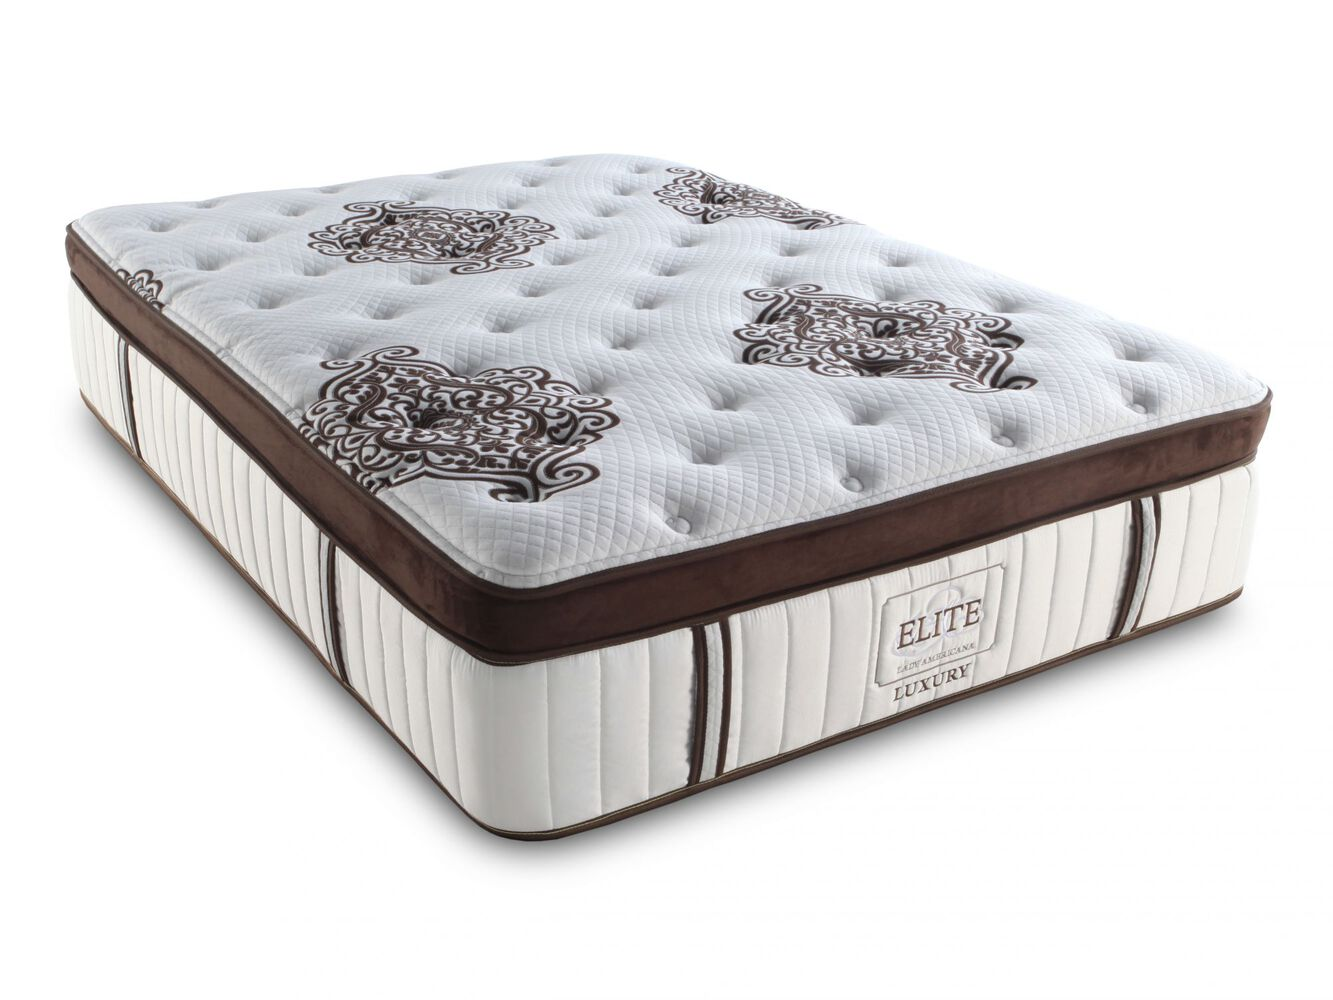 Lady americana elite luxury resplendent mattress mathis for Top 10 best beds